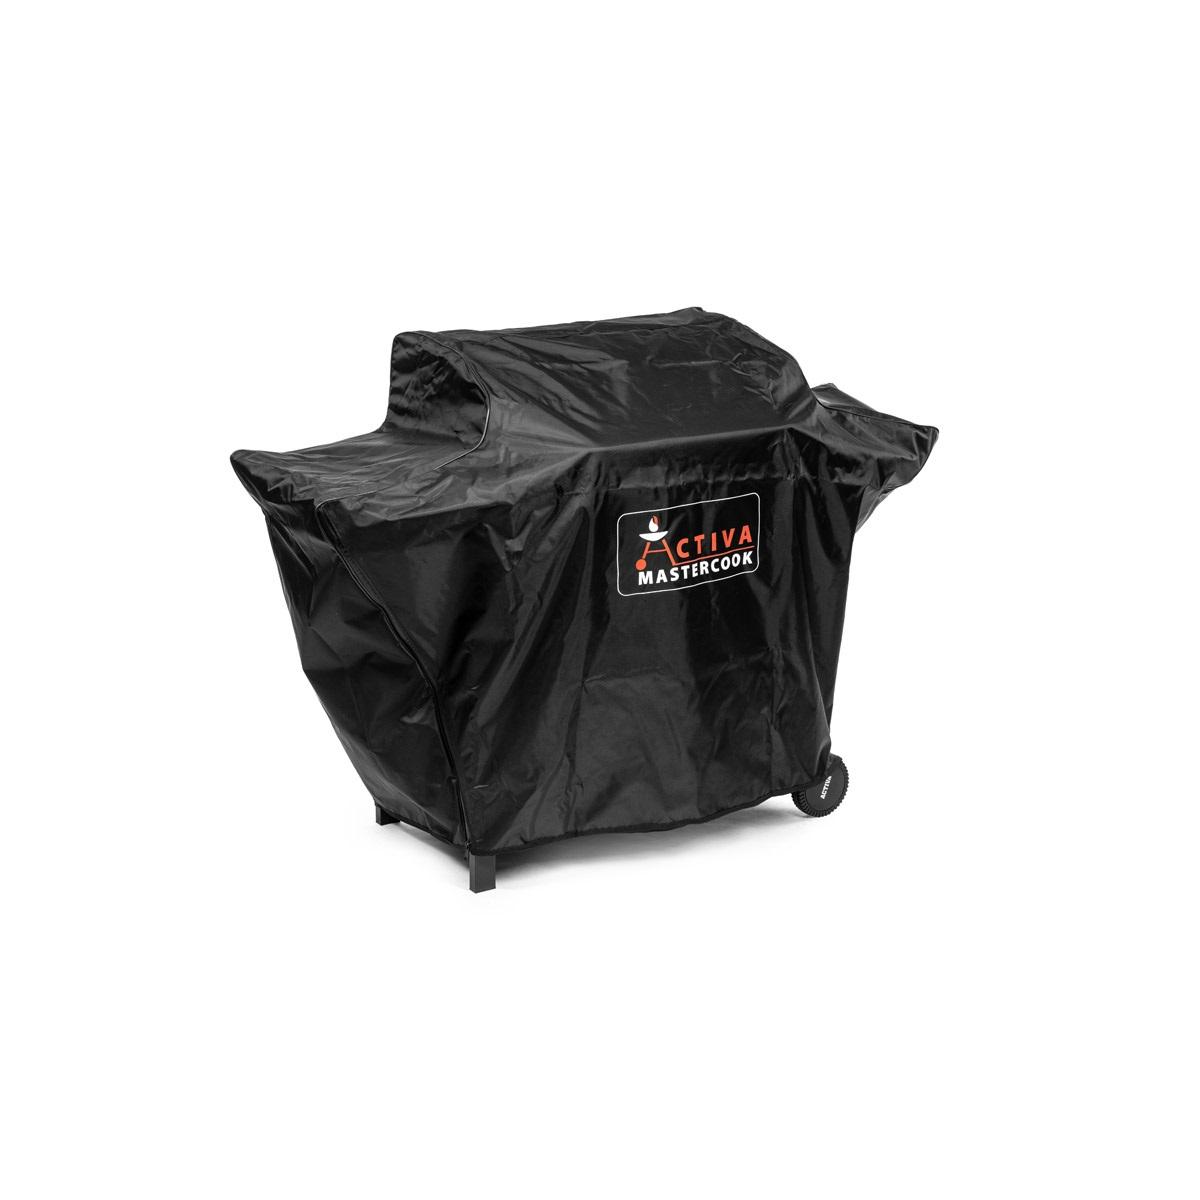 Activa Ochranný obal na gril Premium Pro XL (187 x 108,5 x 62 cm)